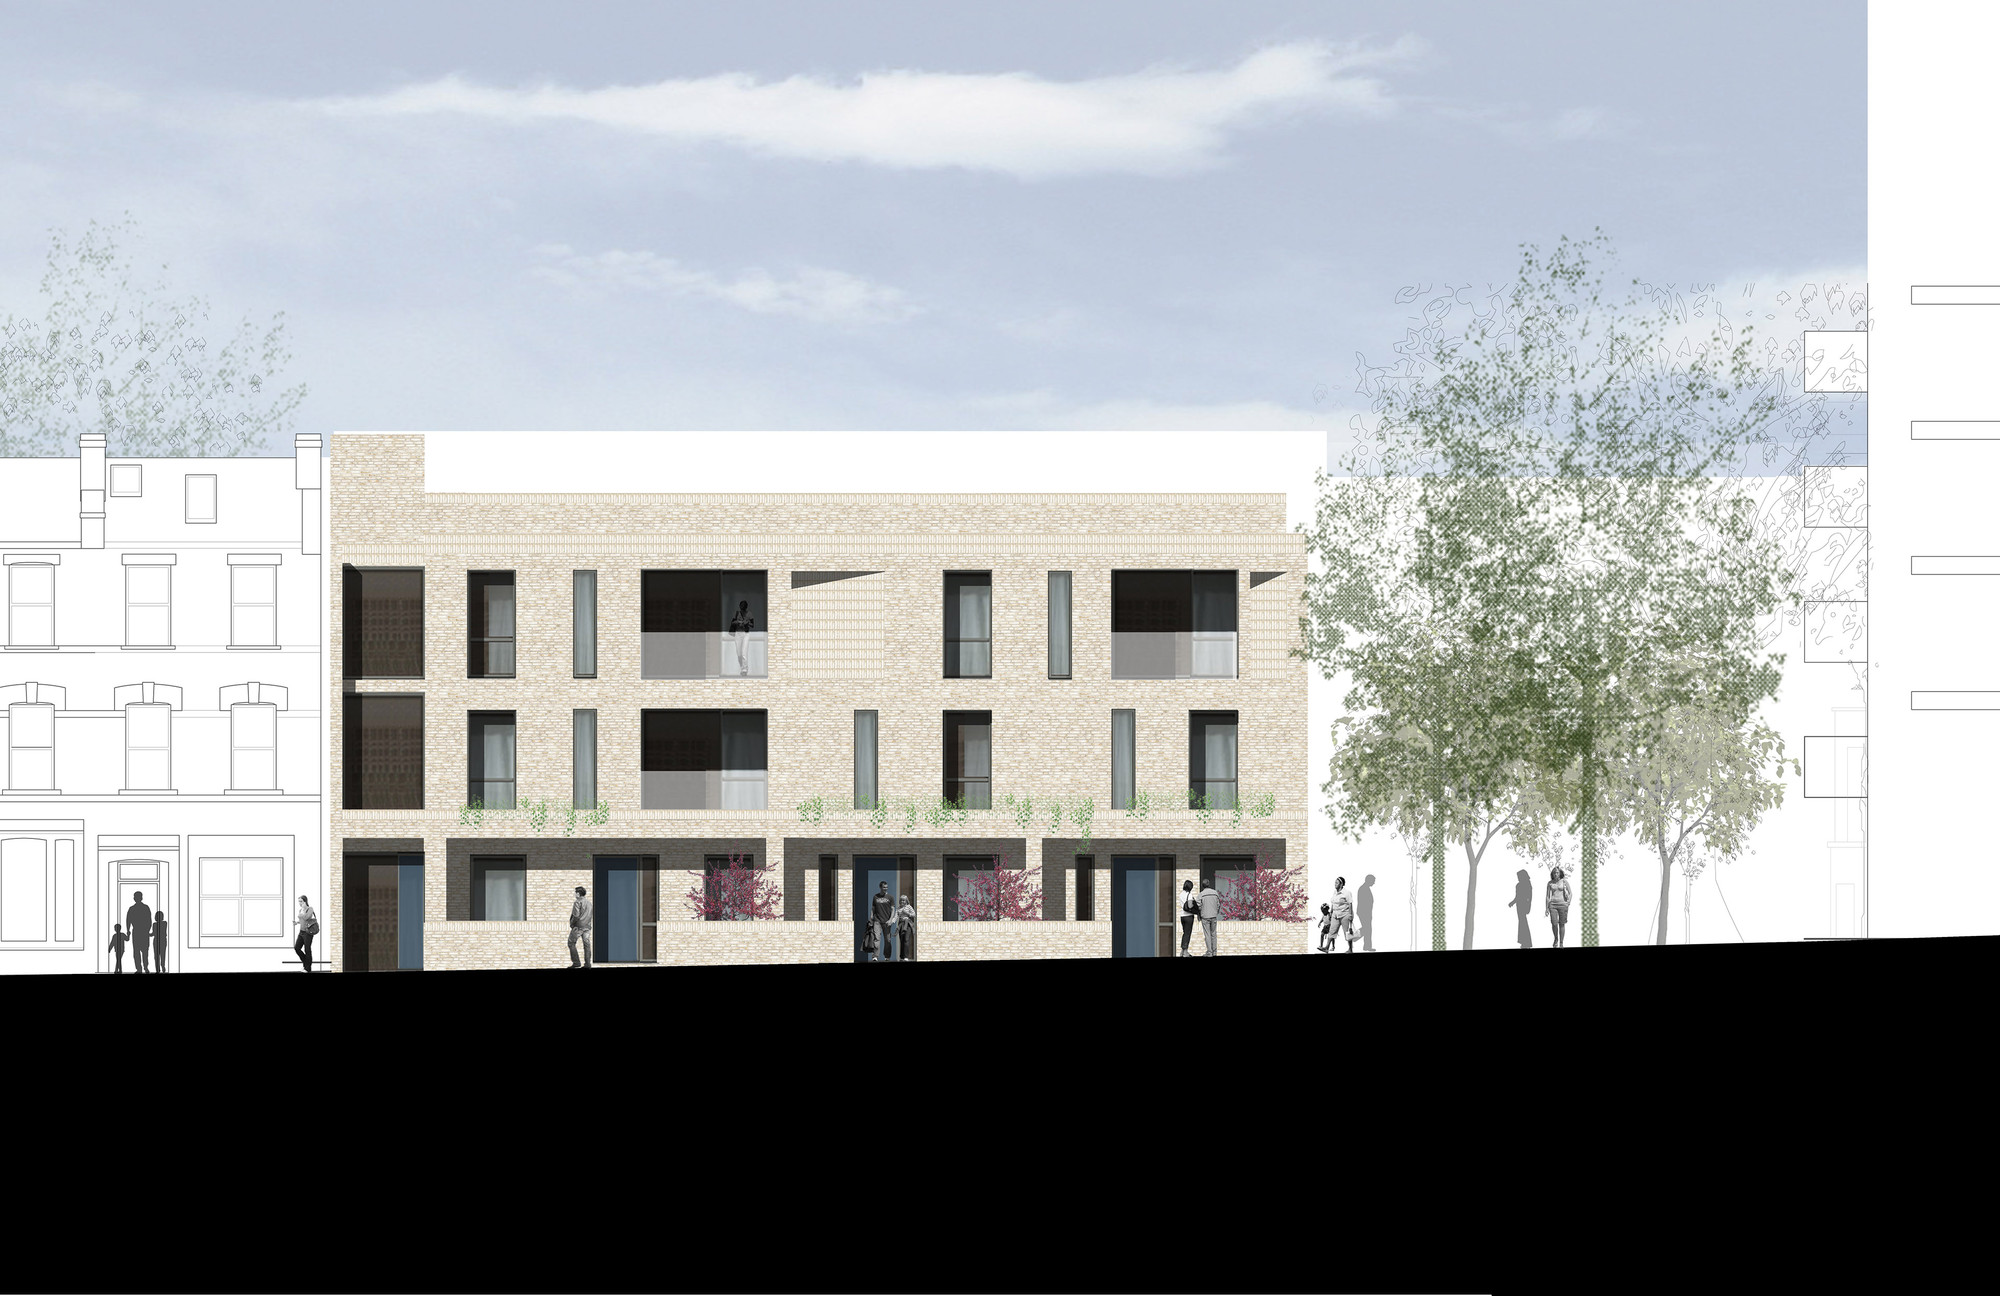 Gallery of Inventive Council Housing / Levitt Bernstein - 23